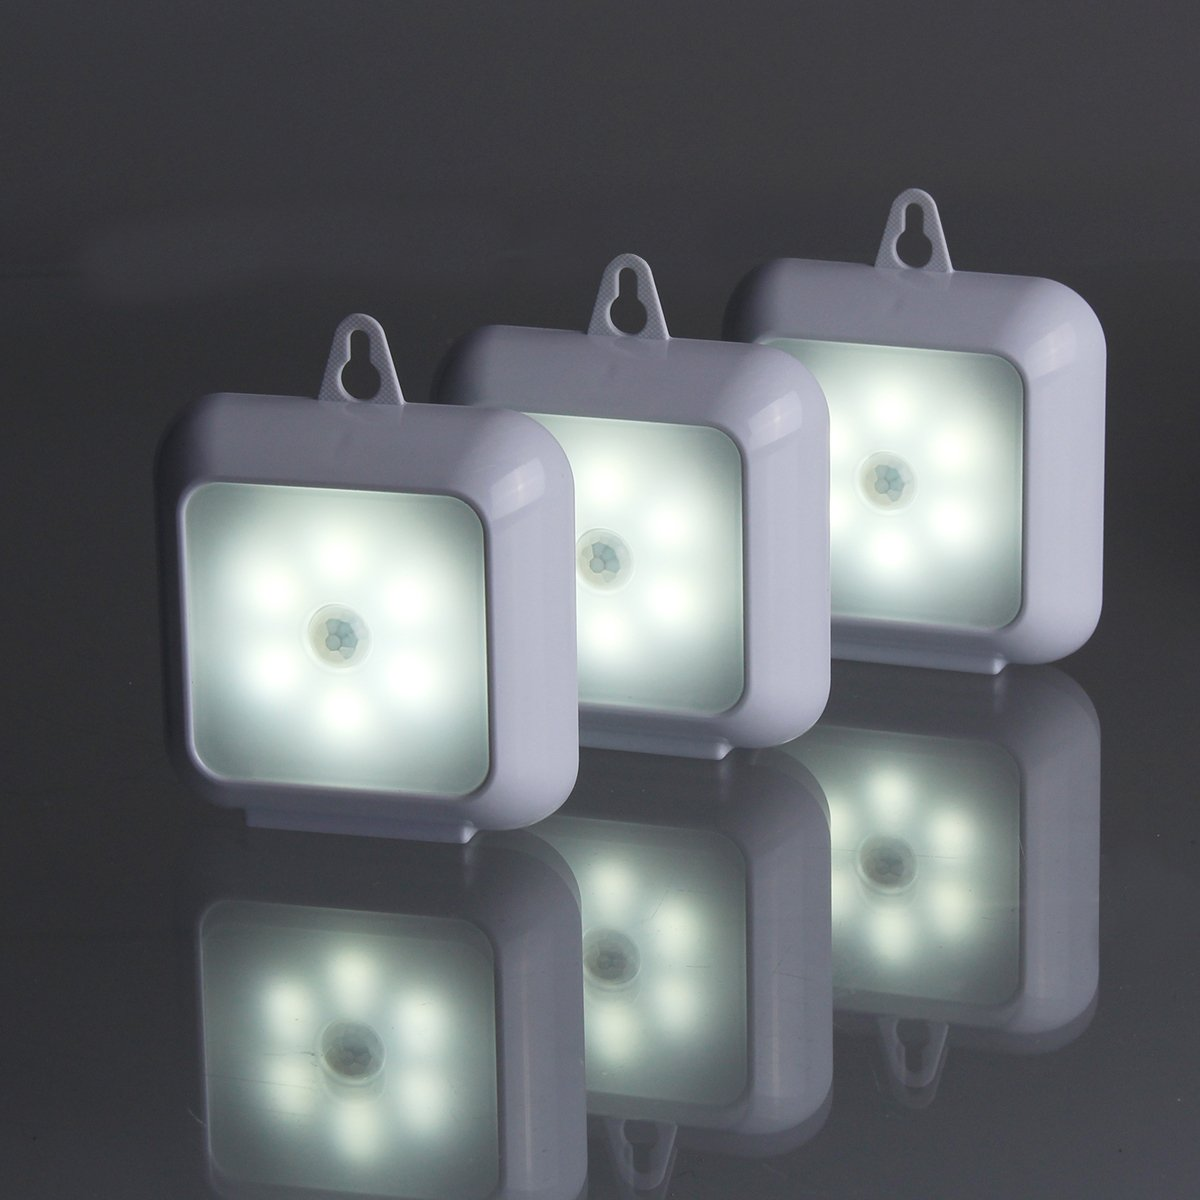 Luz LED Sensor Movimiento,Elfeland® 6 LED Lámpara Nocturna Automática Luz de Pared Cuadrado Luz Nocturna Inalámbrica para Armario Pasillo Escaleras ...